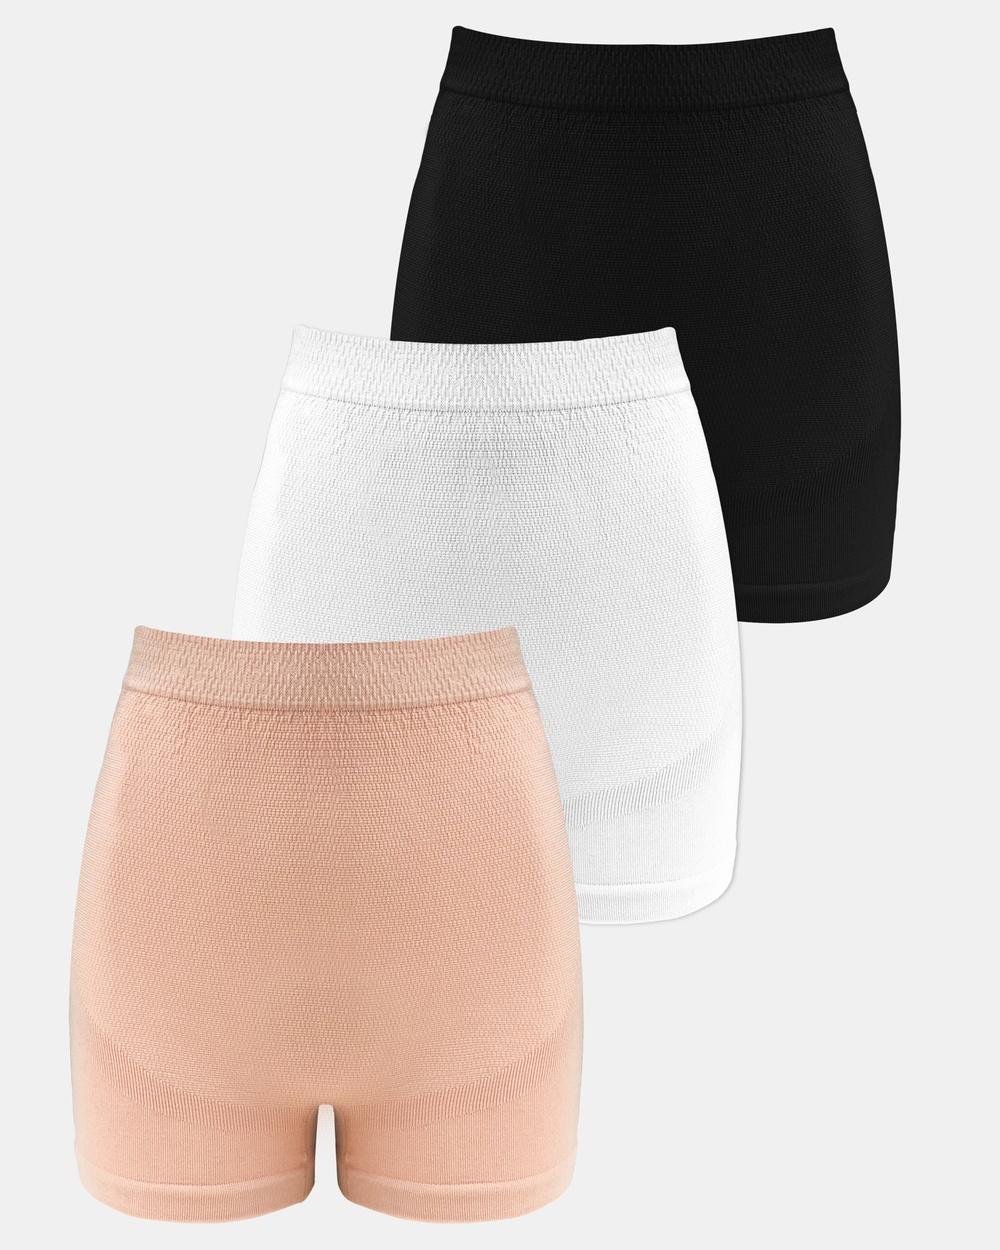 B Free Intimate Apparel 3 Pack Maternity Boyleg Shorts Briefs Black White Nude 3-Pack Australia